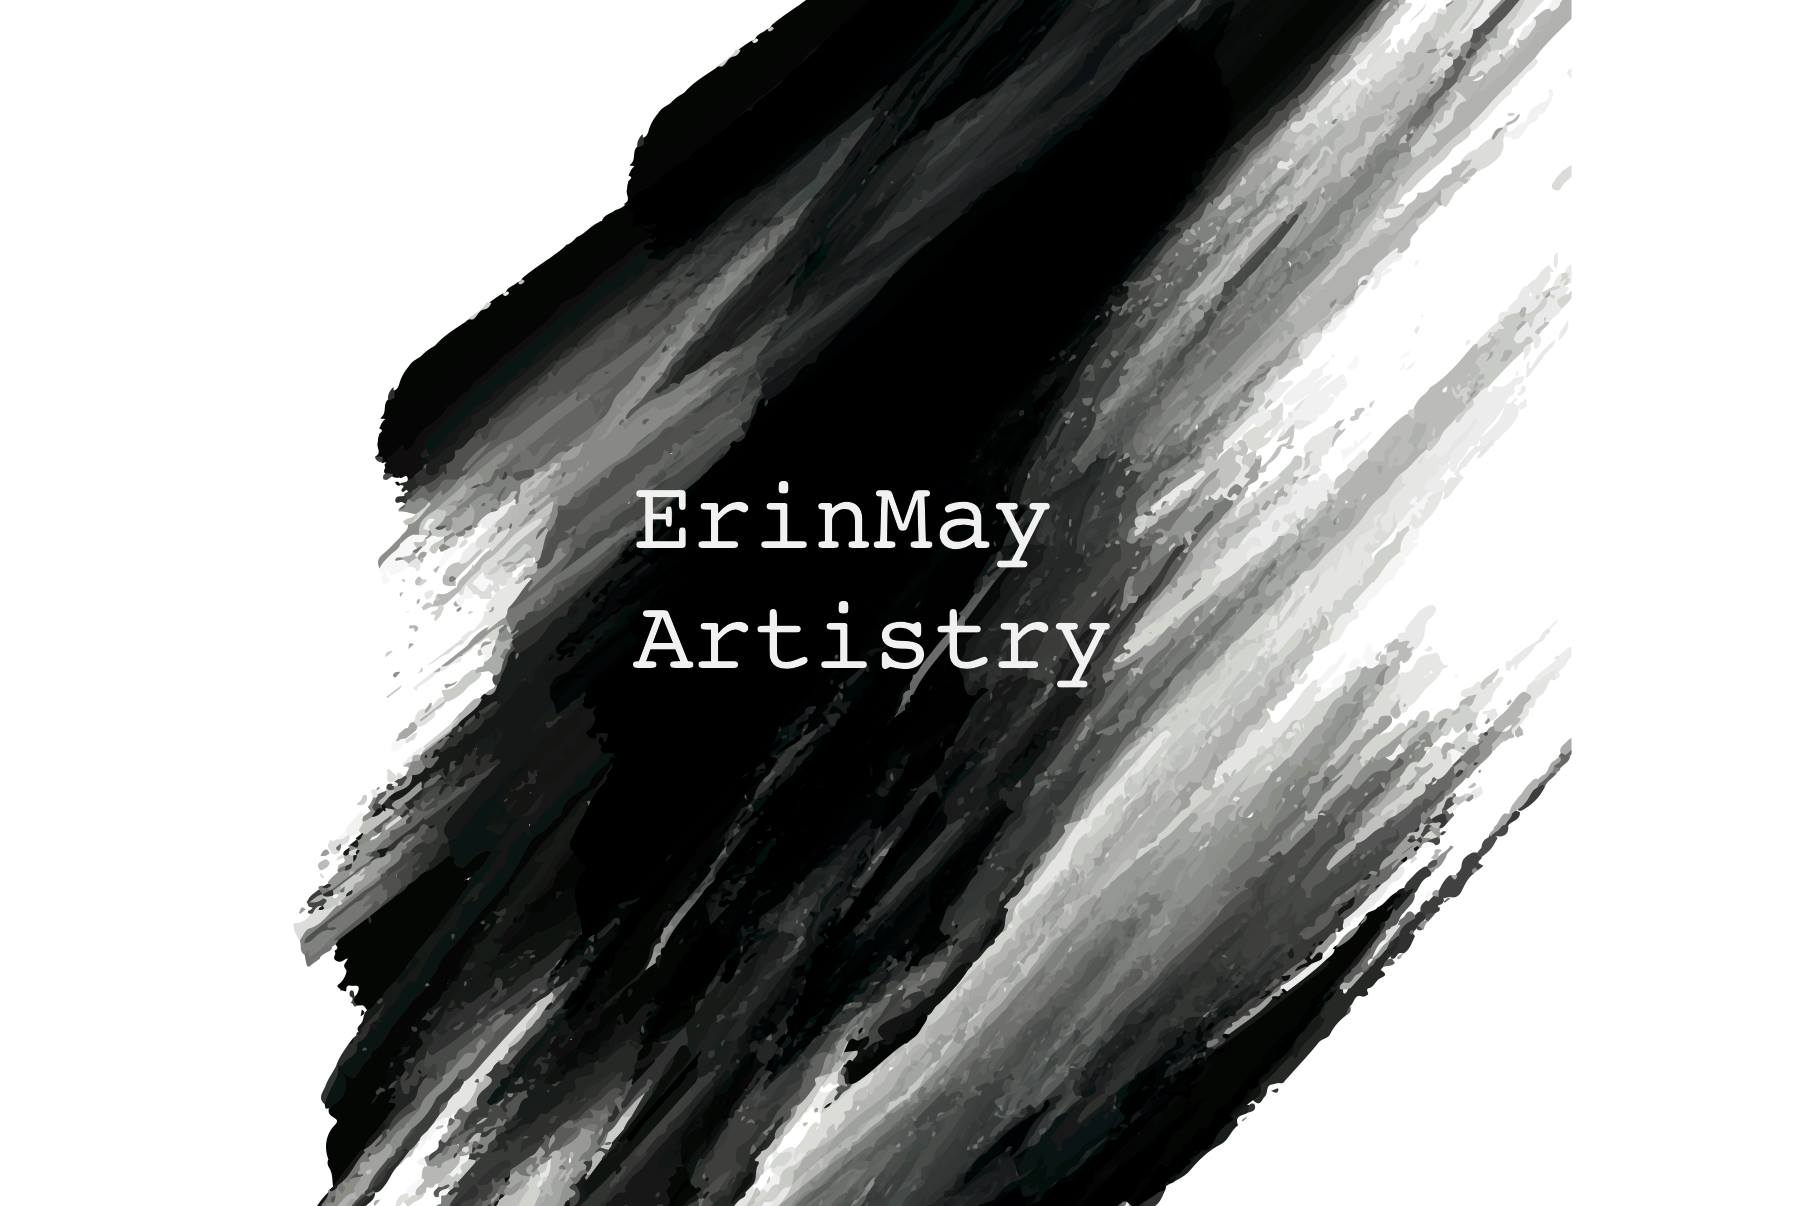 ErinMAY ARTISTRY Signature